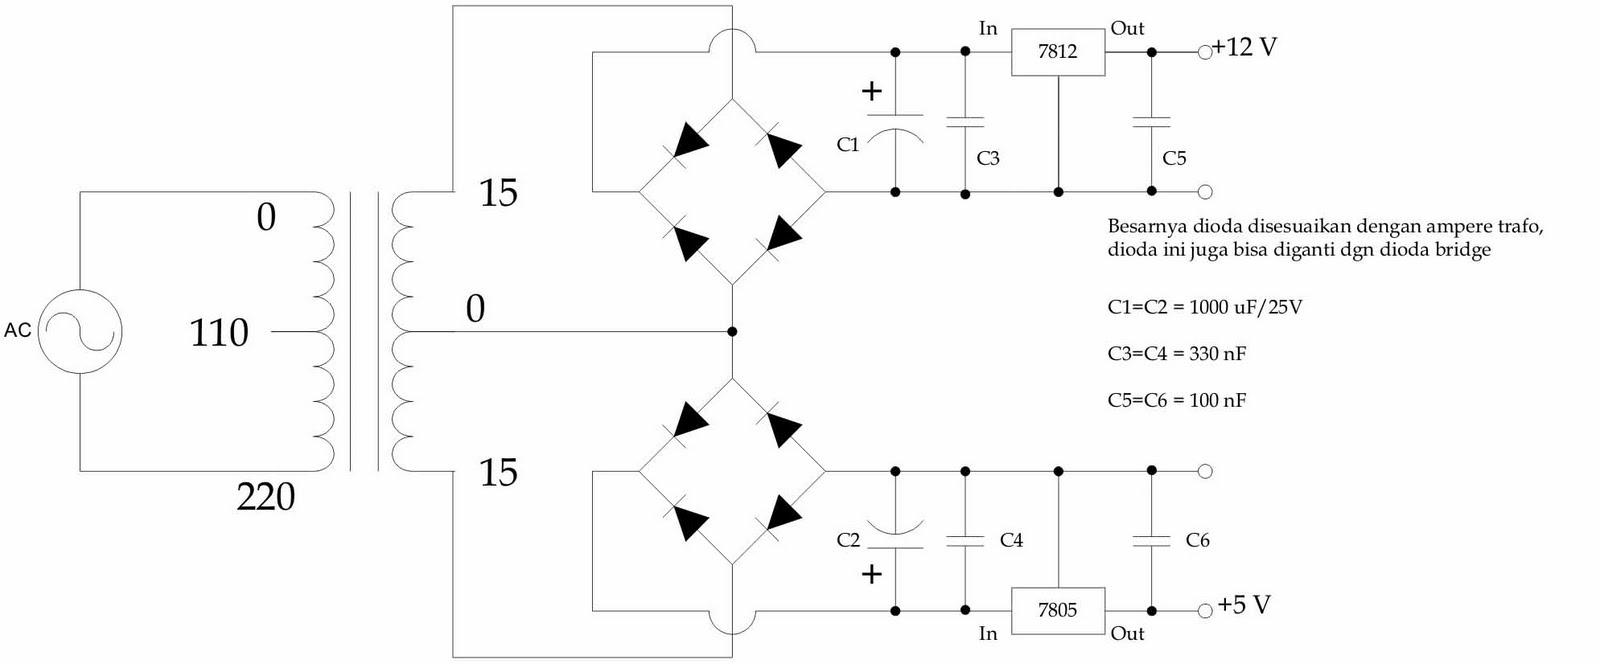 schematic diagram power supply dual output 12v 5v [ 1600 x 664 Pixel ]